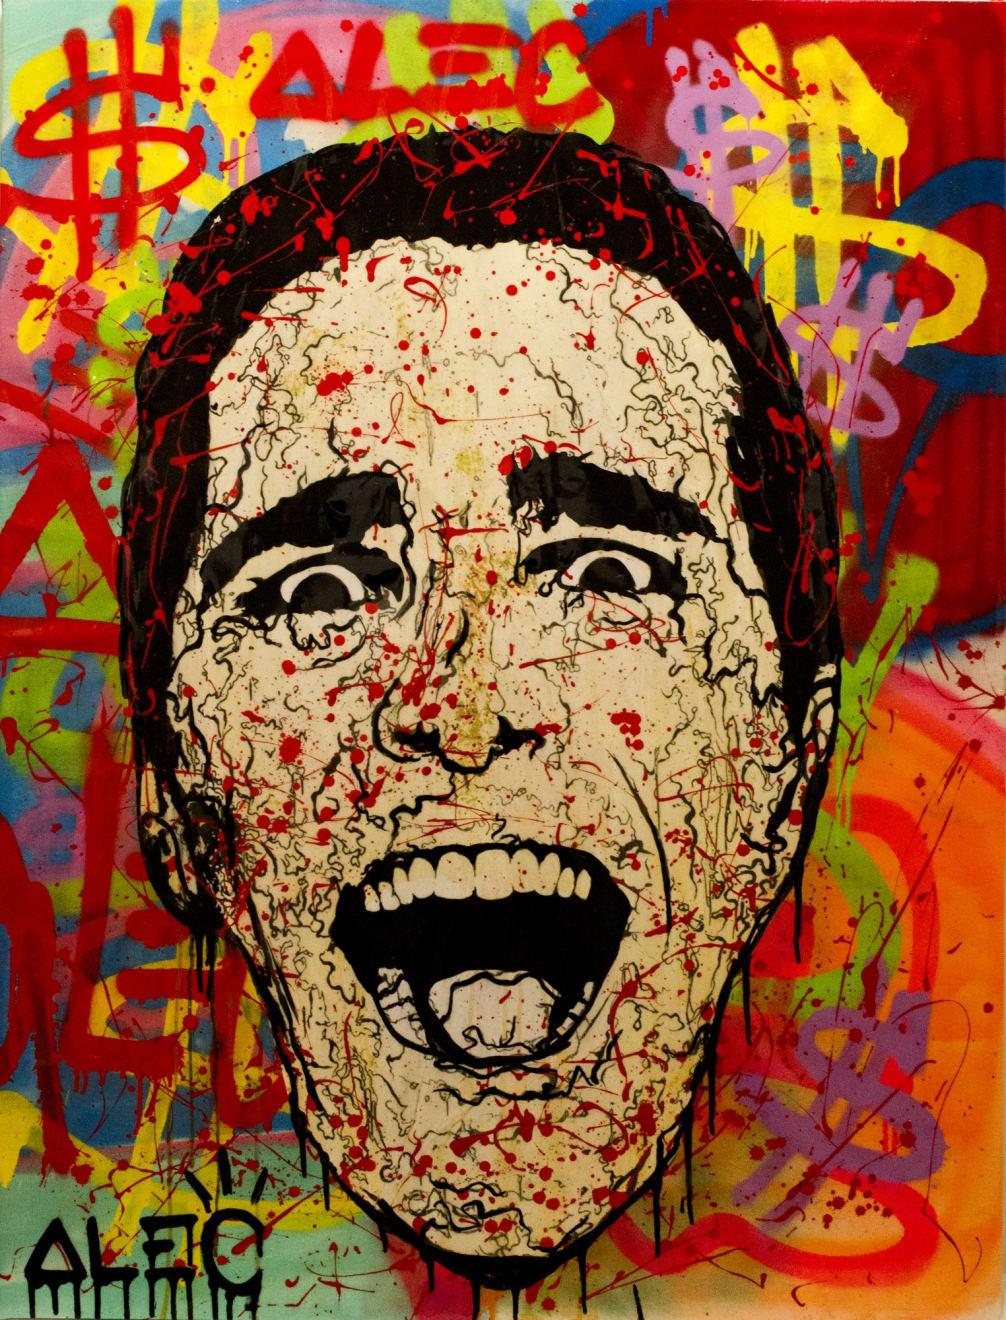 Alec Monopoly Bateman - The Scream, 2013